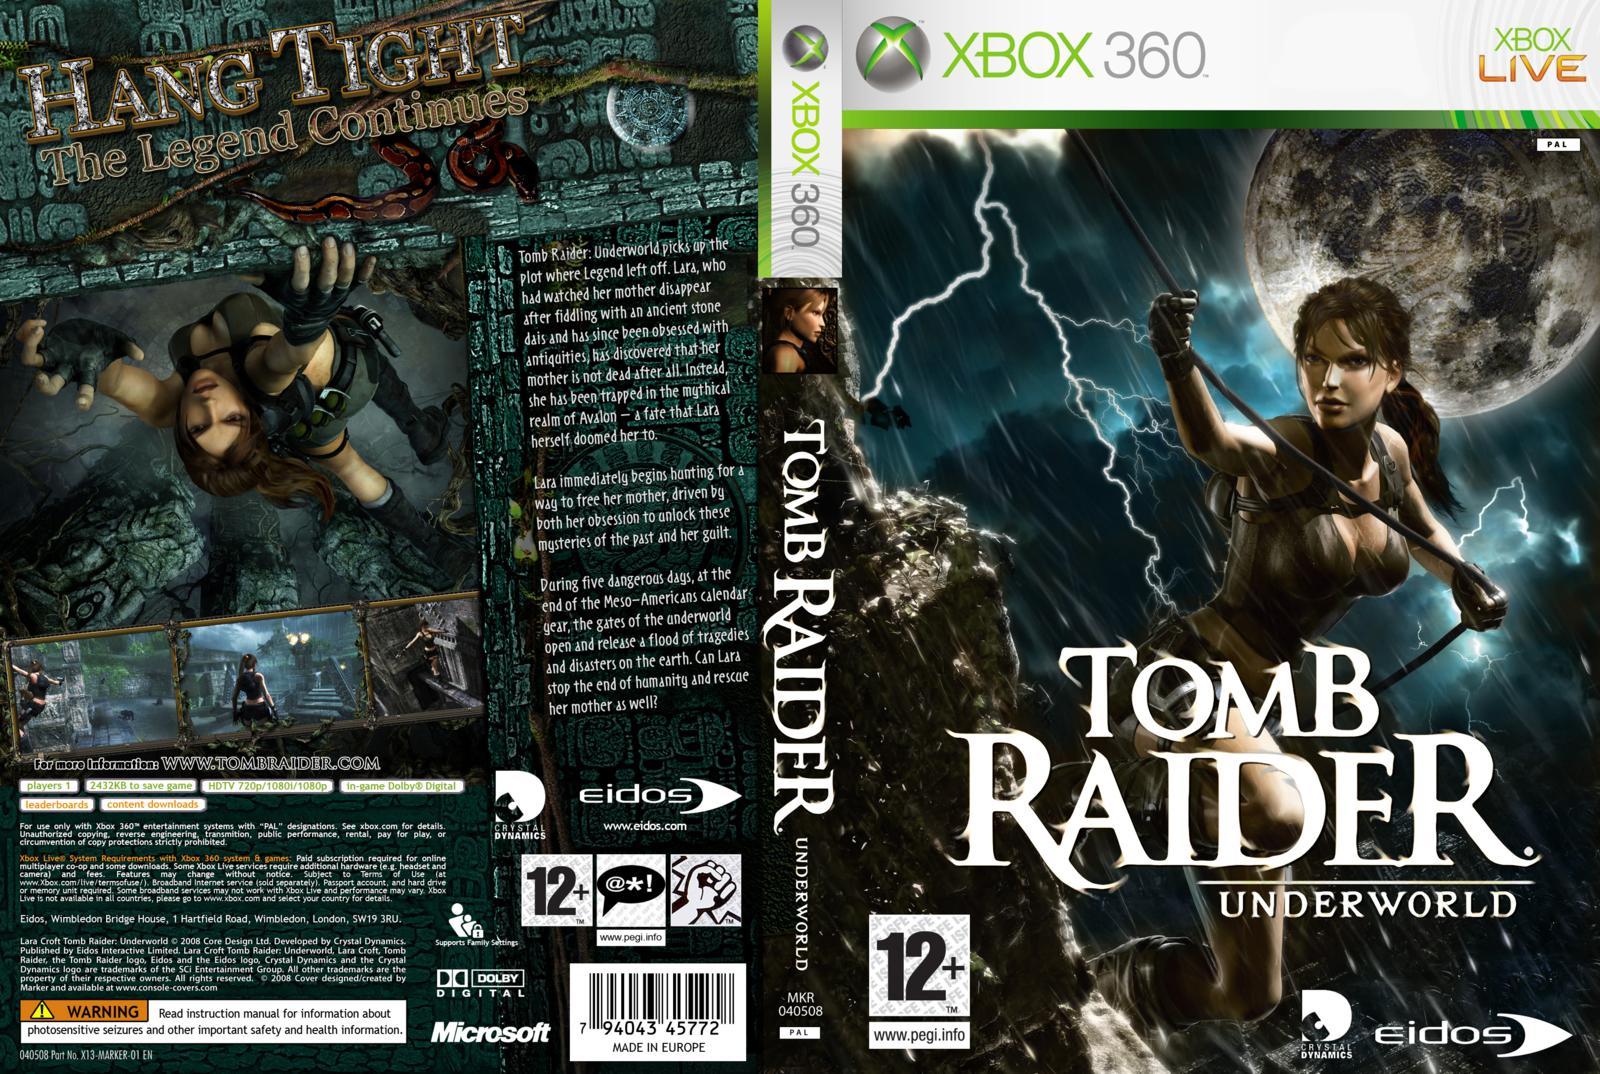 http://4.bp.blogspot.com/-Hs7zdtcjHtk/T070_N8vRrI/AAAAAAAAO70/1yZa6enAPmo/s1600/17860-tomb-raider-underworld-print.jpg